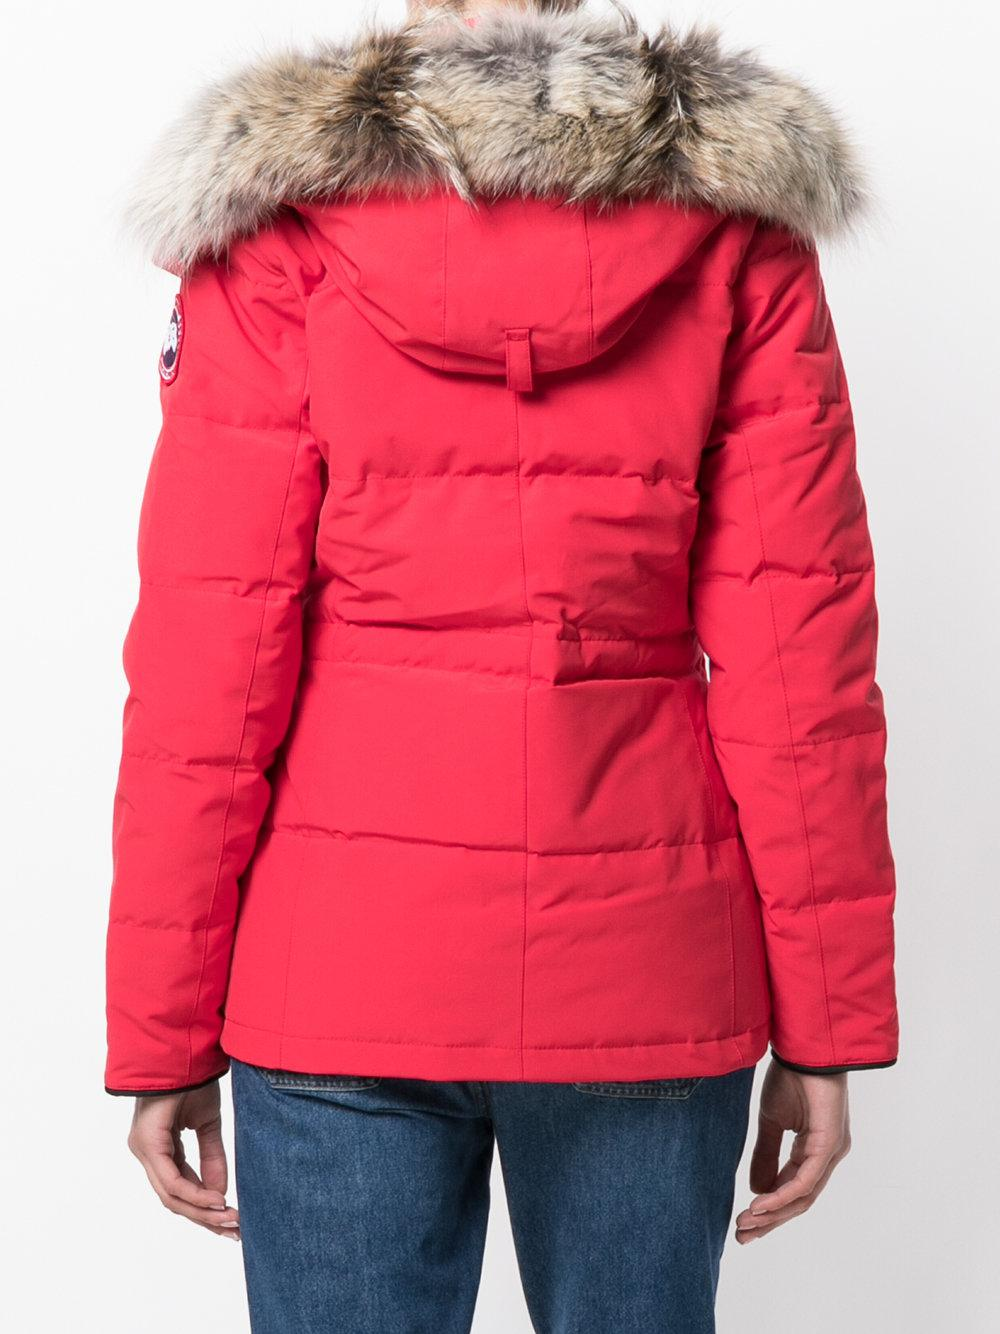 Goose Feather Jacket